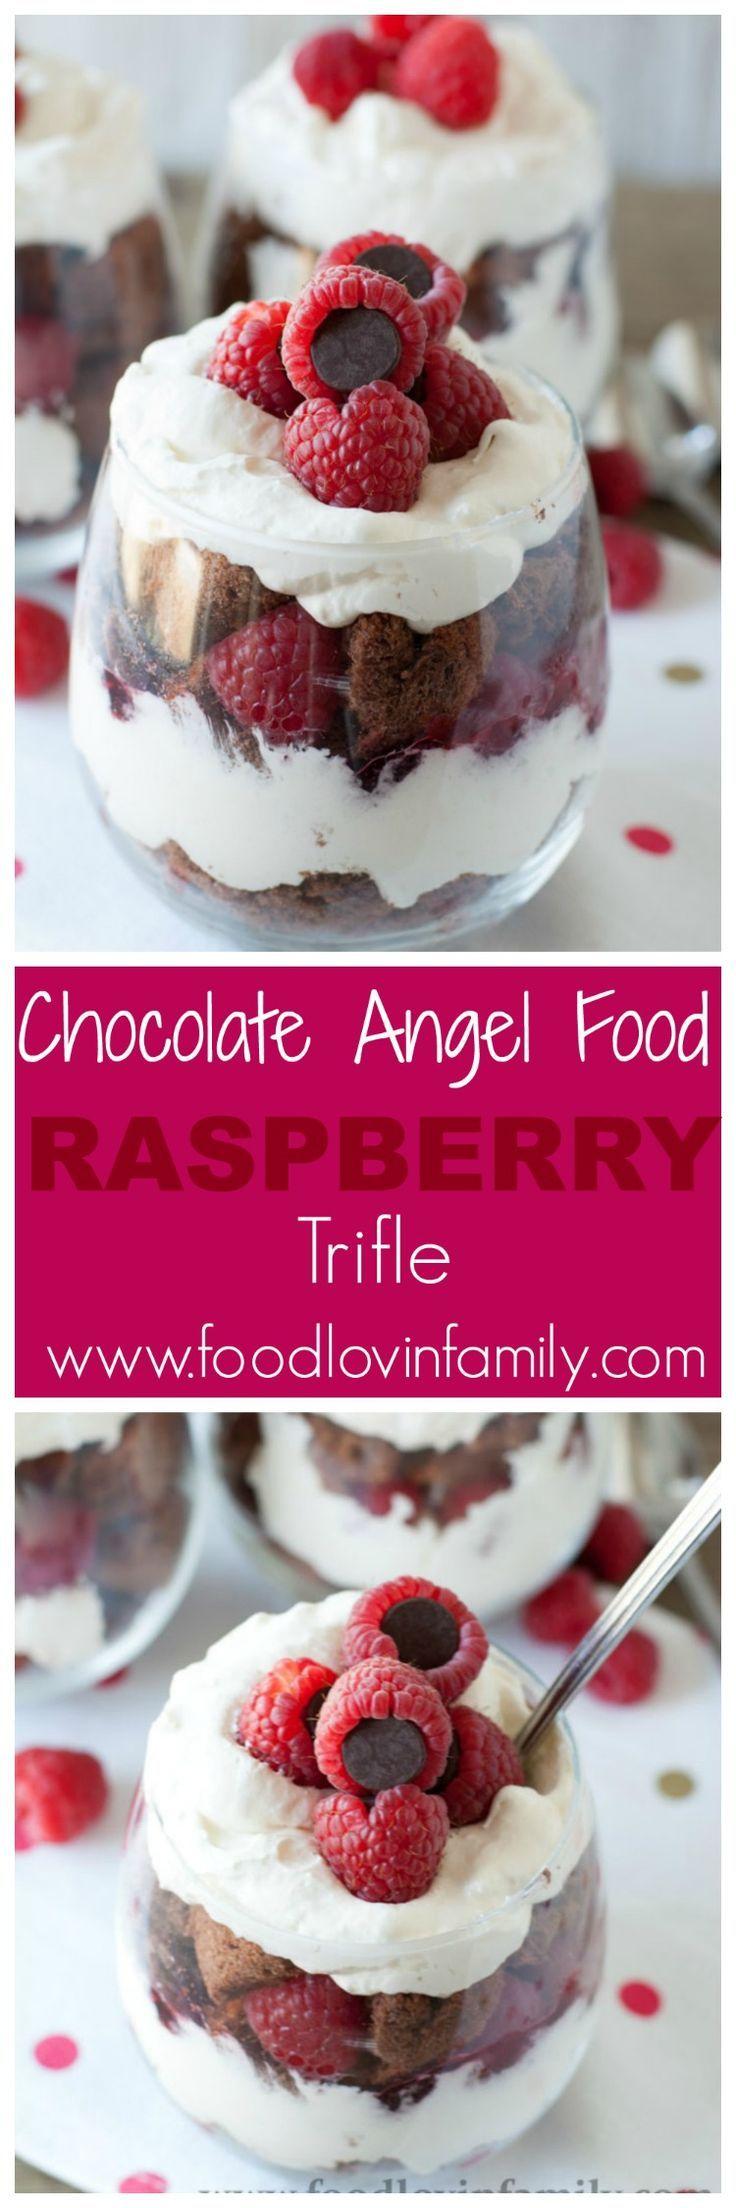 Chocolate angel food cake layered with cream and raspberries, celebrate this Valentine's Day with this easy chocolate angel food cake + raspberry trifle.